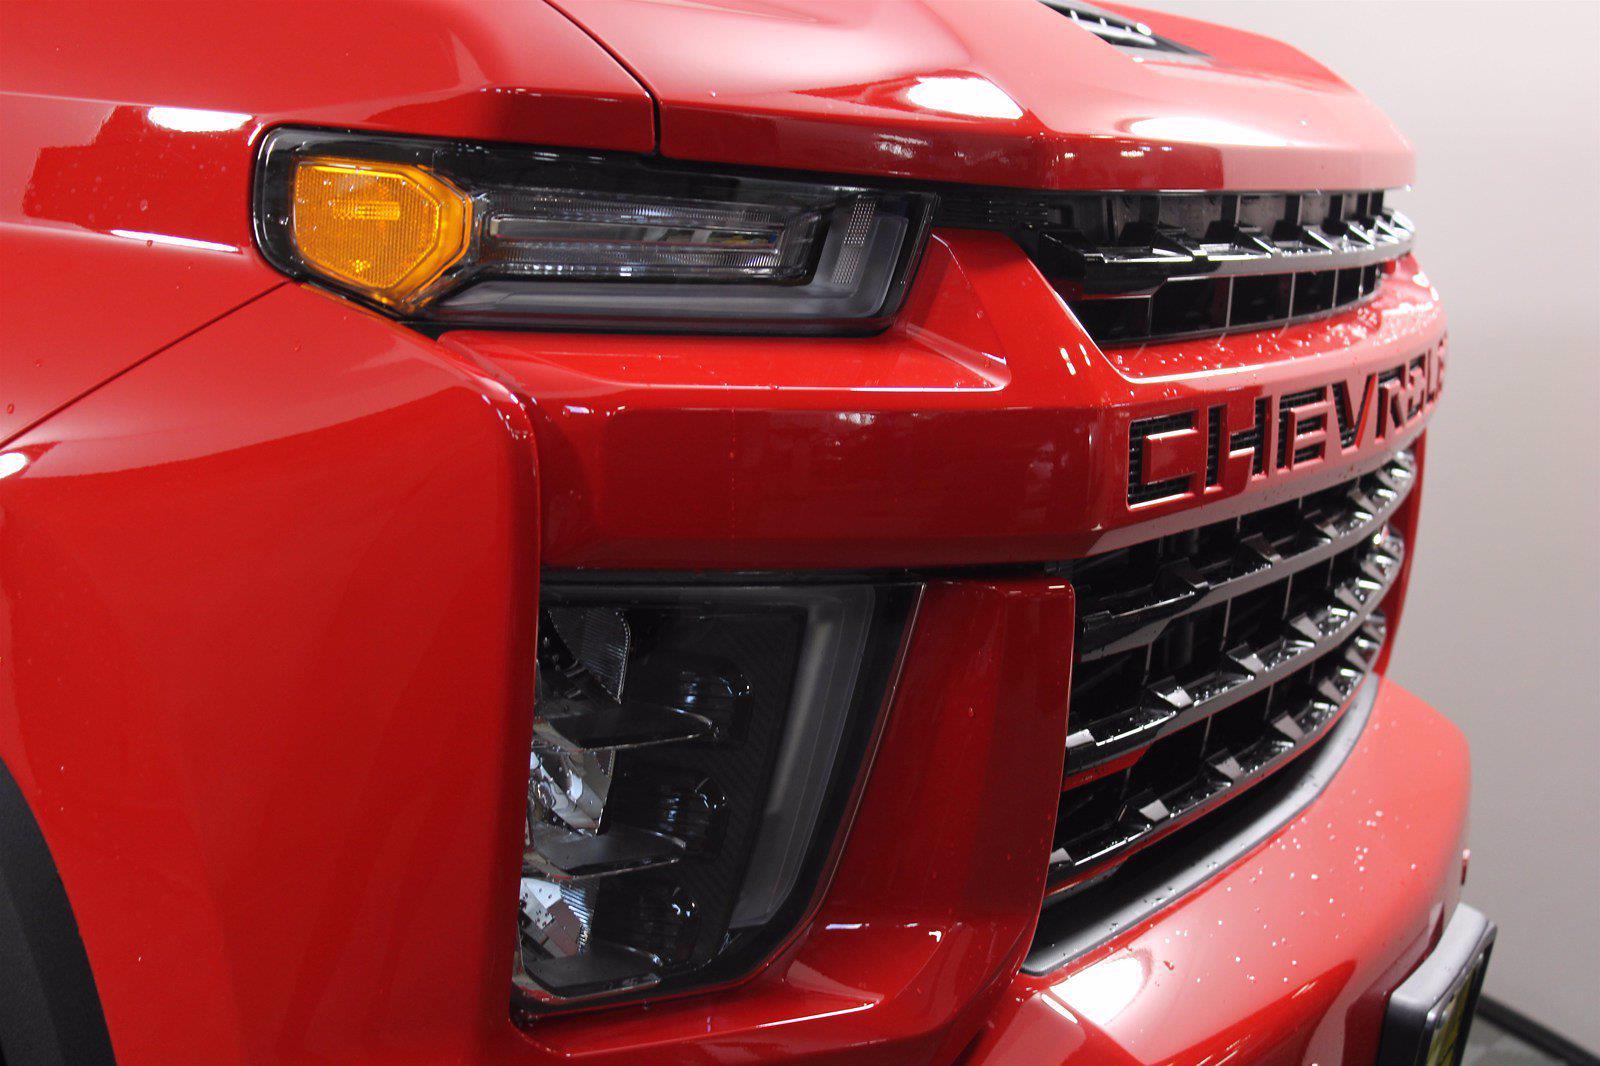 2021 Chevrolet Silverado 2500 Crew Cab 4x4, Pickup #D110744 - photo 4